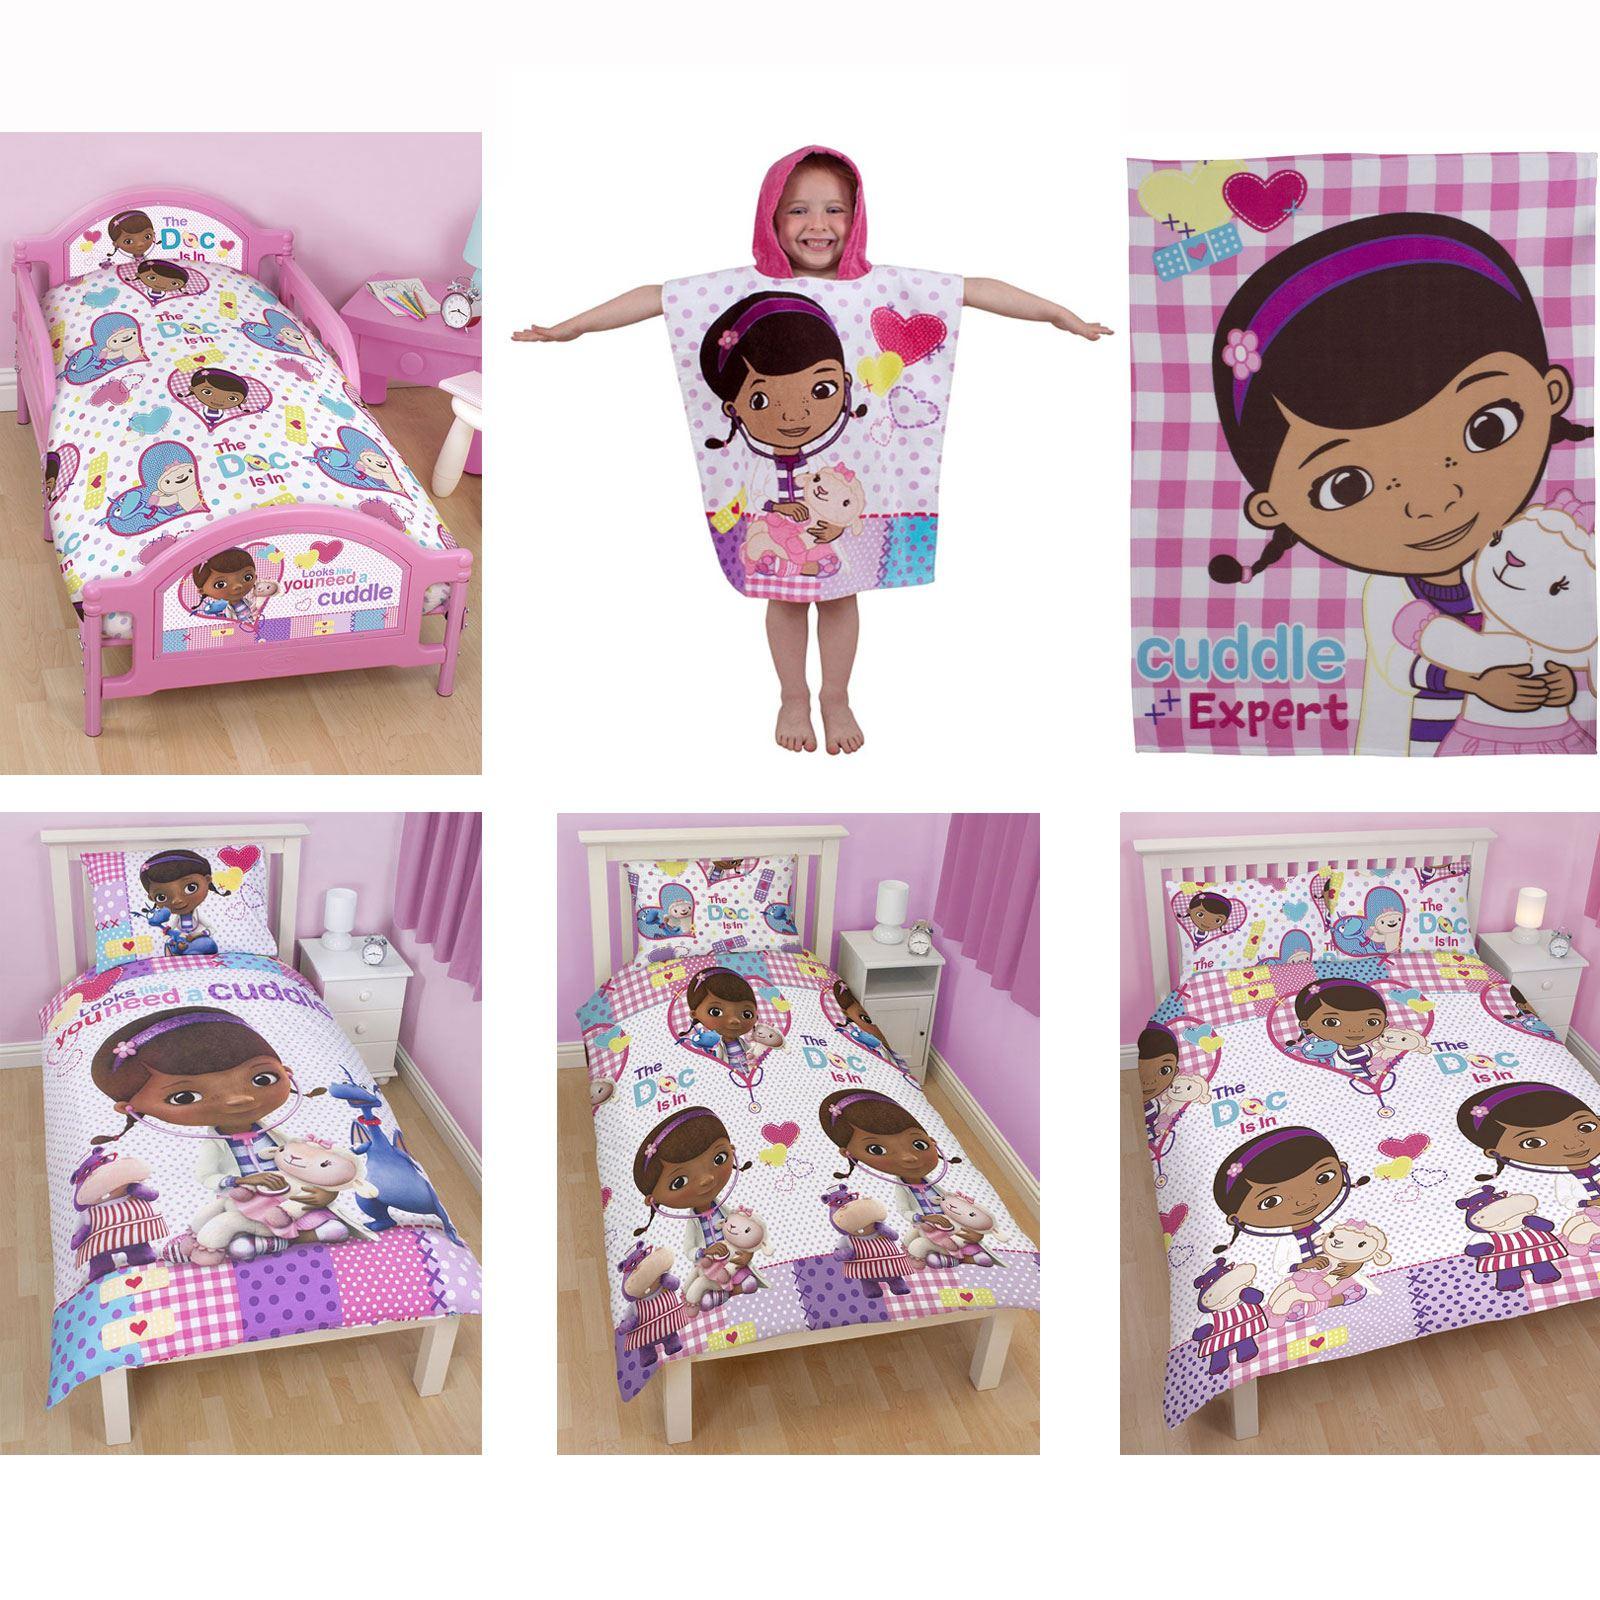 doc mcstuffins upholstered chair uk swivel beach bedroom bedding duvet covers in single and